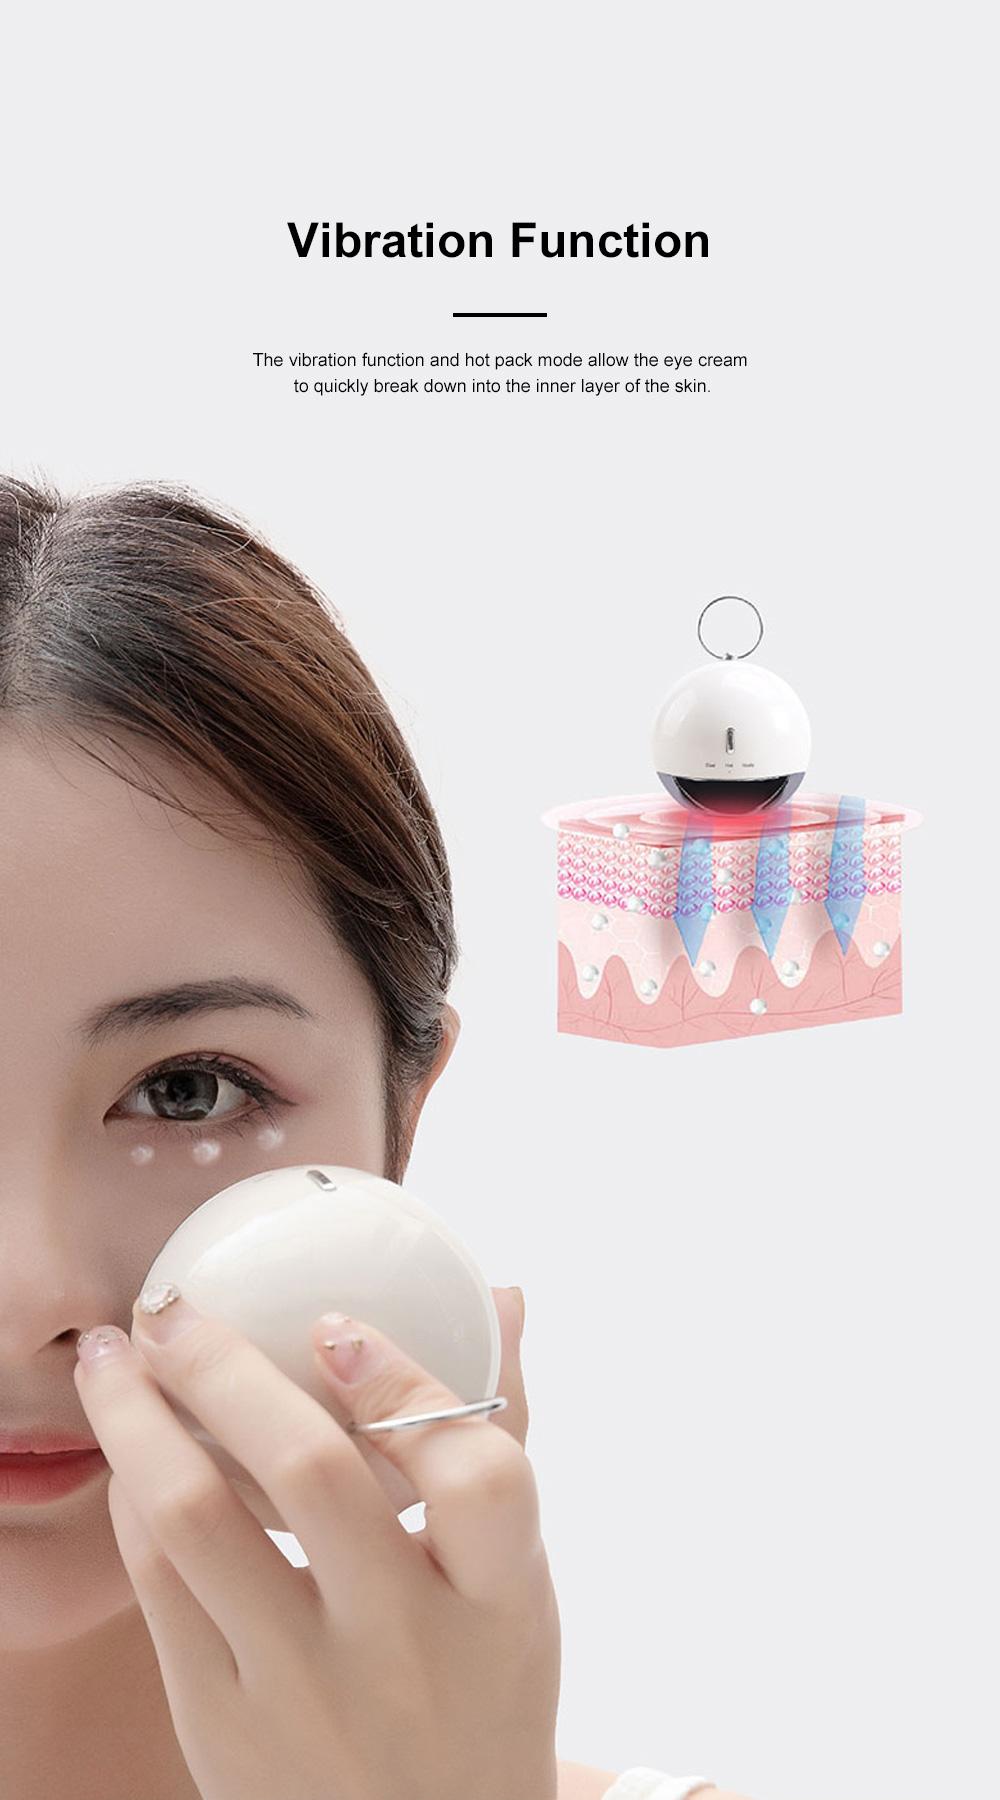 MIPOW Eye Massage Machine Portable Long Endurance Remove Black Circle Wrinkles Hot Cold Compress Dual Modes Vibration Eyes Massager 4